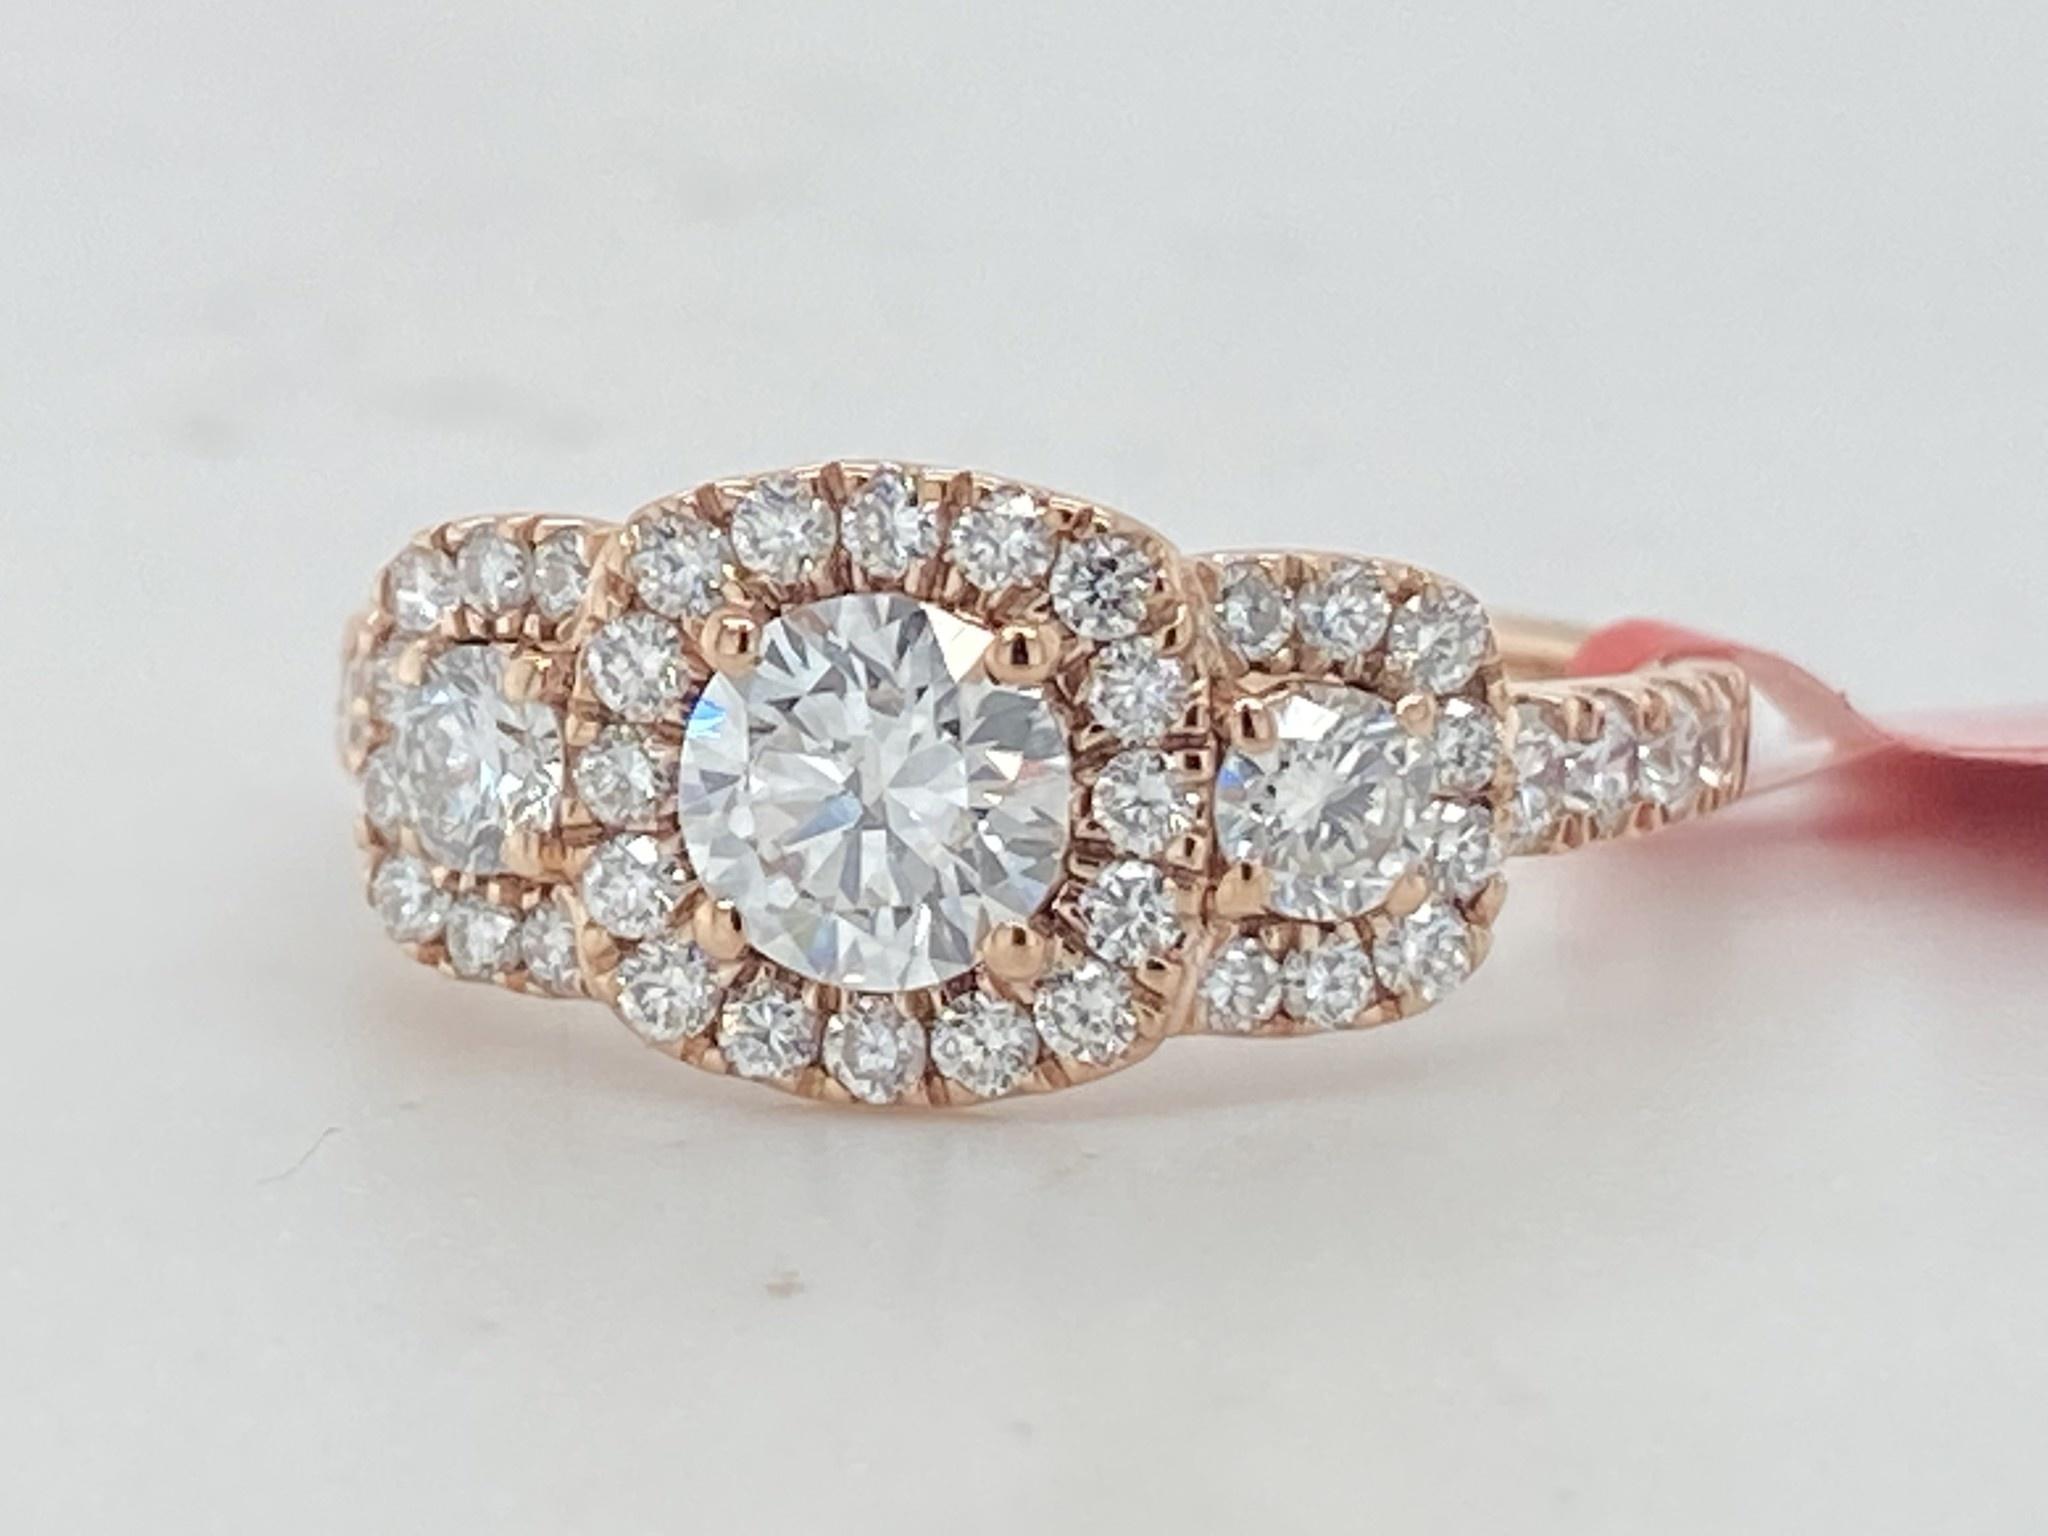 14KR 1.32TW LG Diamond Engagement Ring